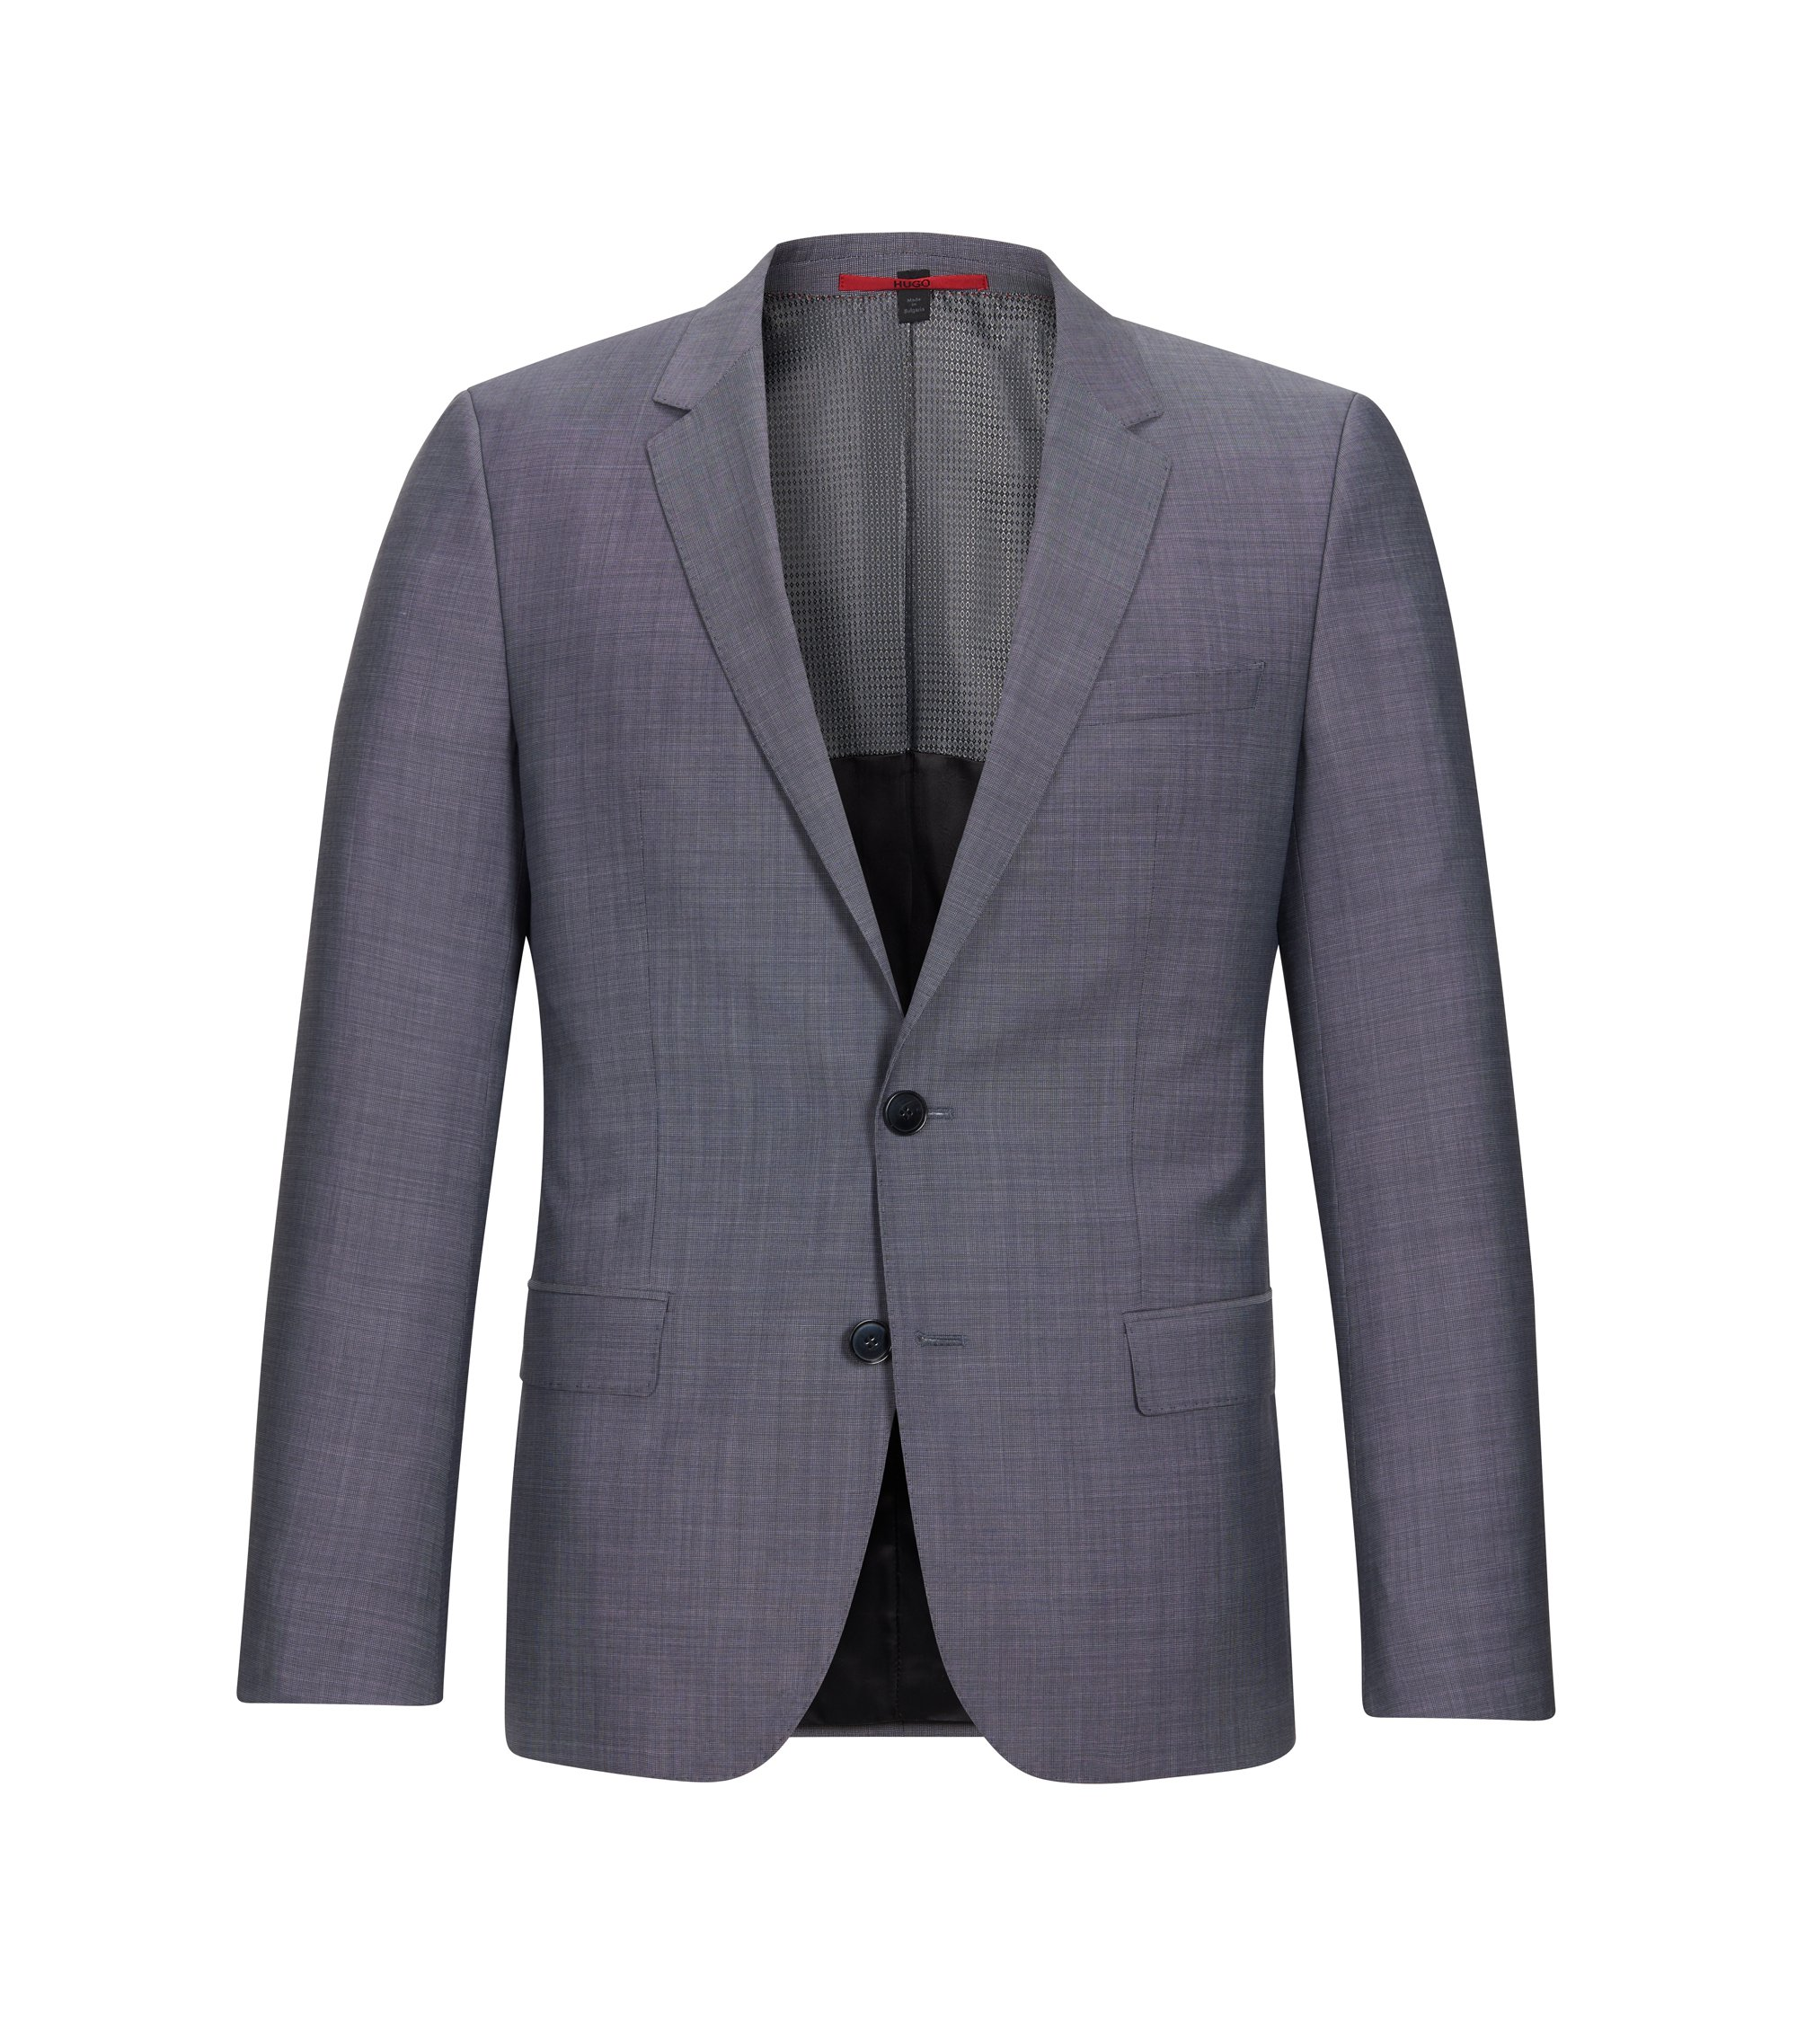 Italian Virgin Wool Sport Coat, Slim Fit | C-Huge, Open Grey